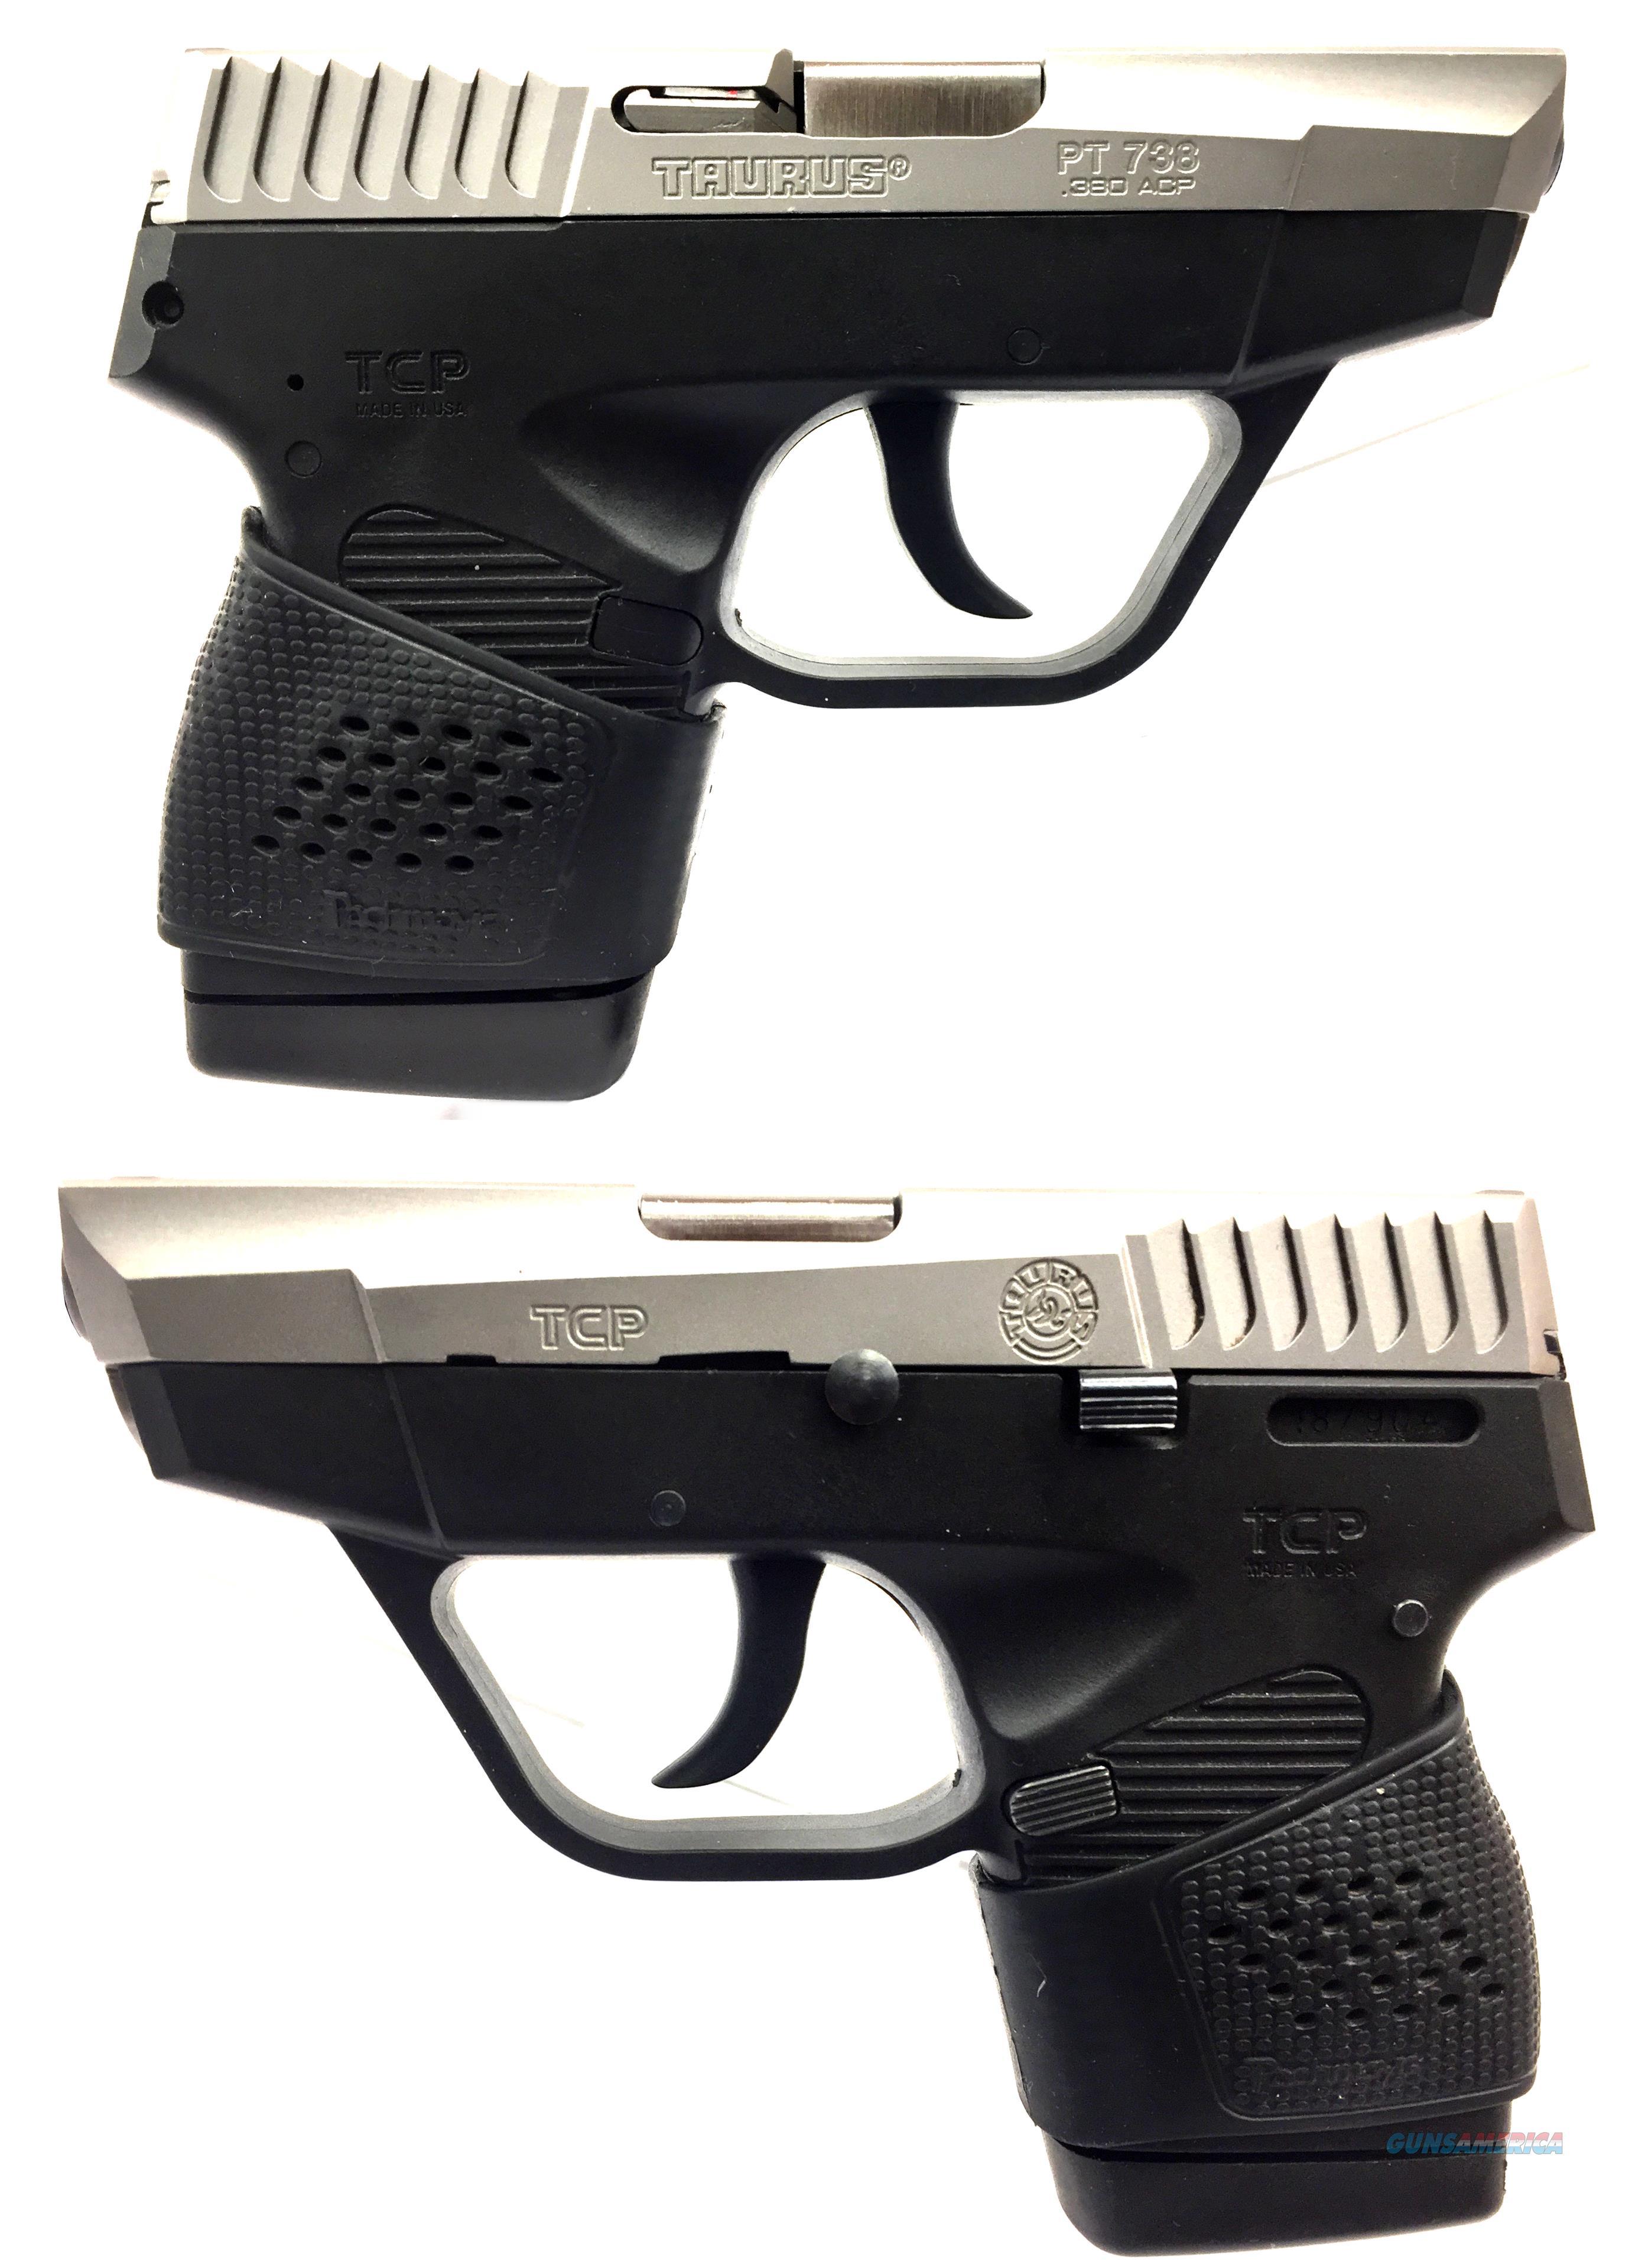 Taurus PT 738 TCP .380 Auto W/ Extras  Guns > Pistols > Taurus Pistols > Semi Auto Pistols > Polymer Frame